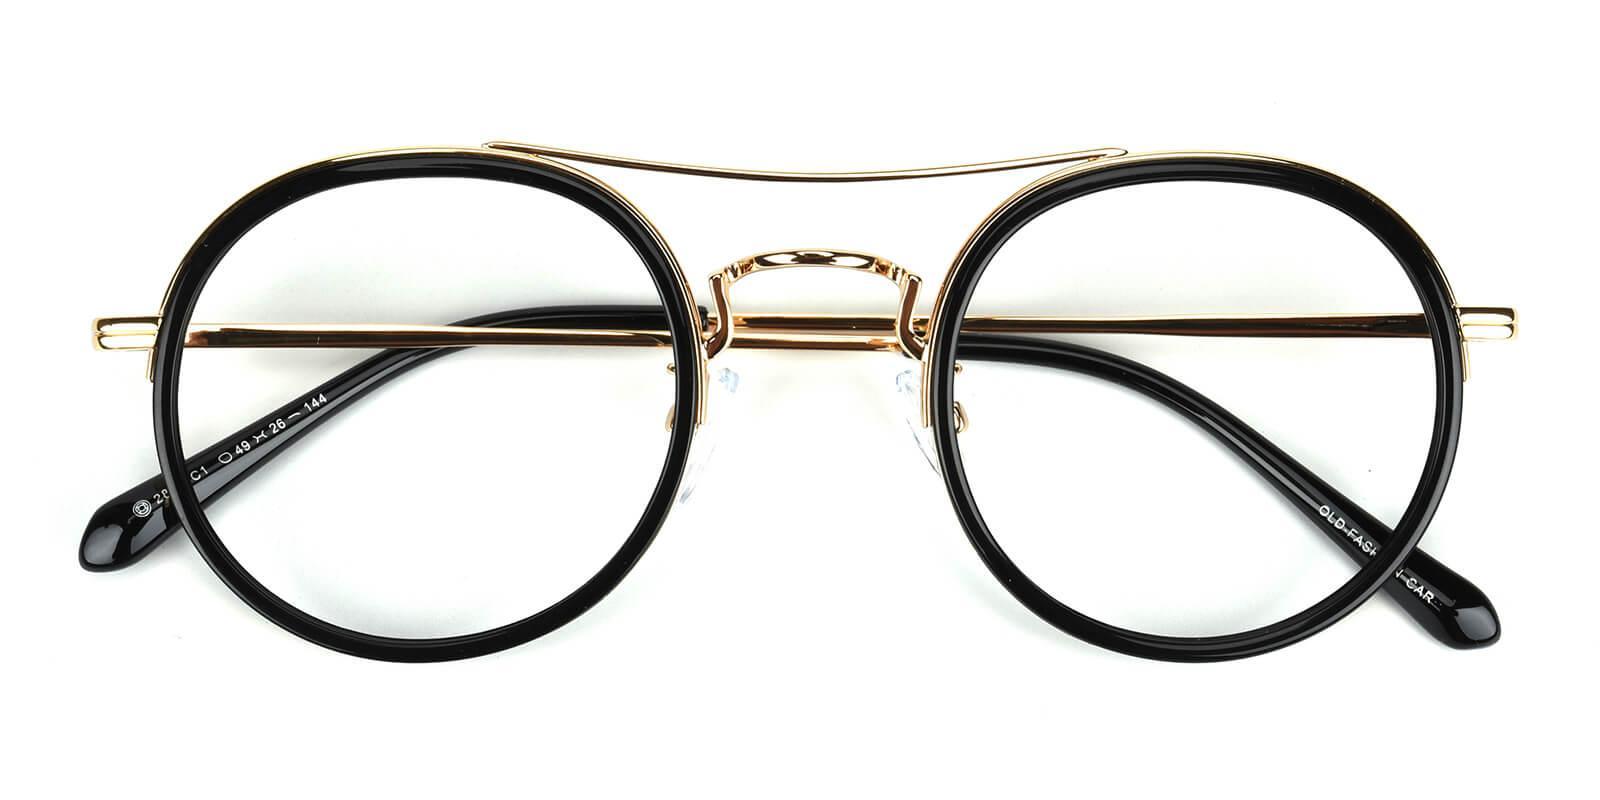 Teddy-Gold-Aviator-Combination-Eyeglasses-detail